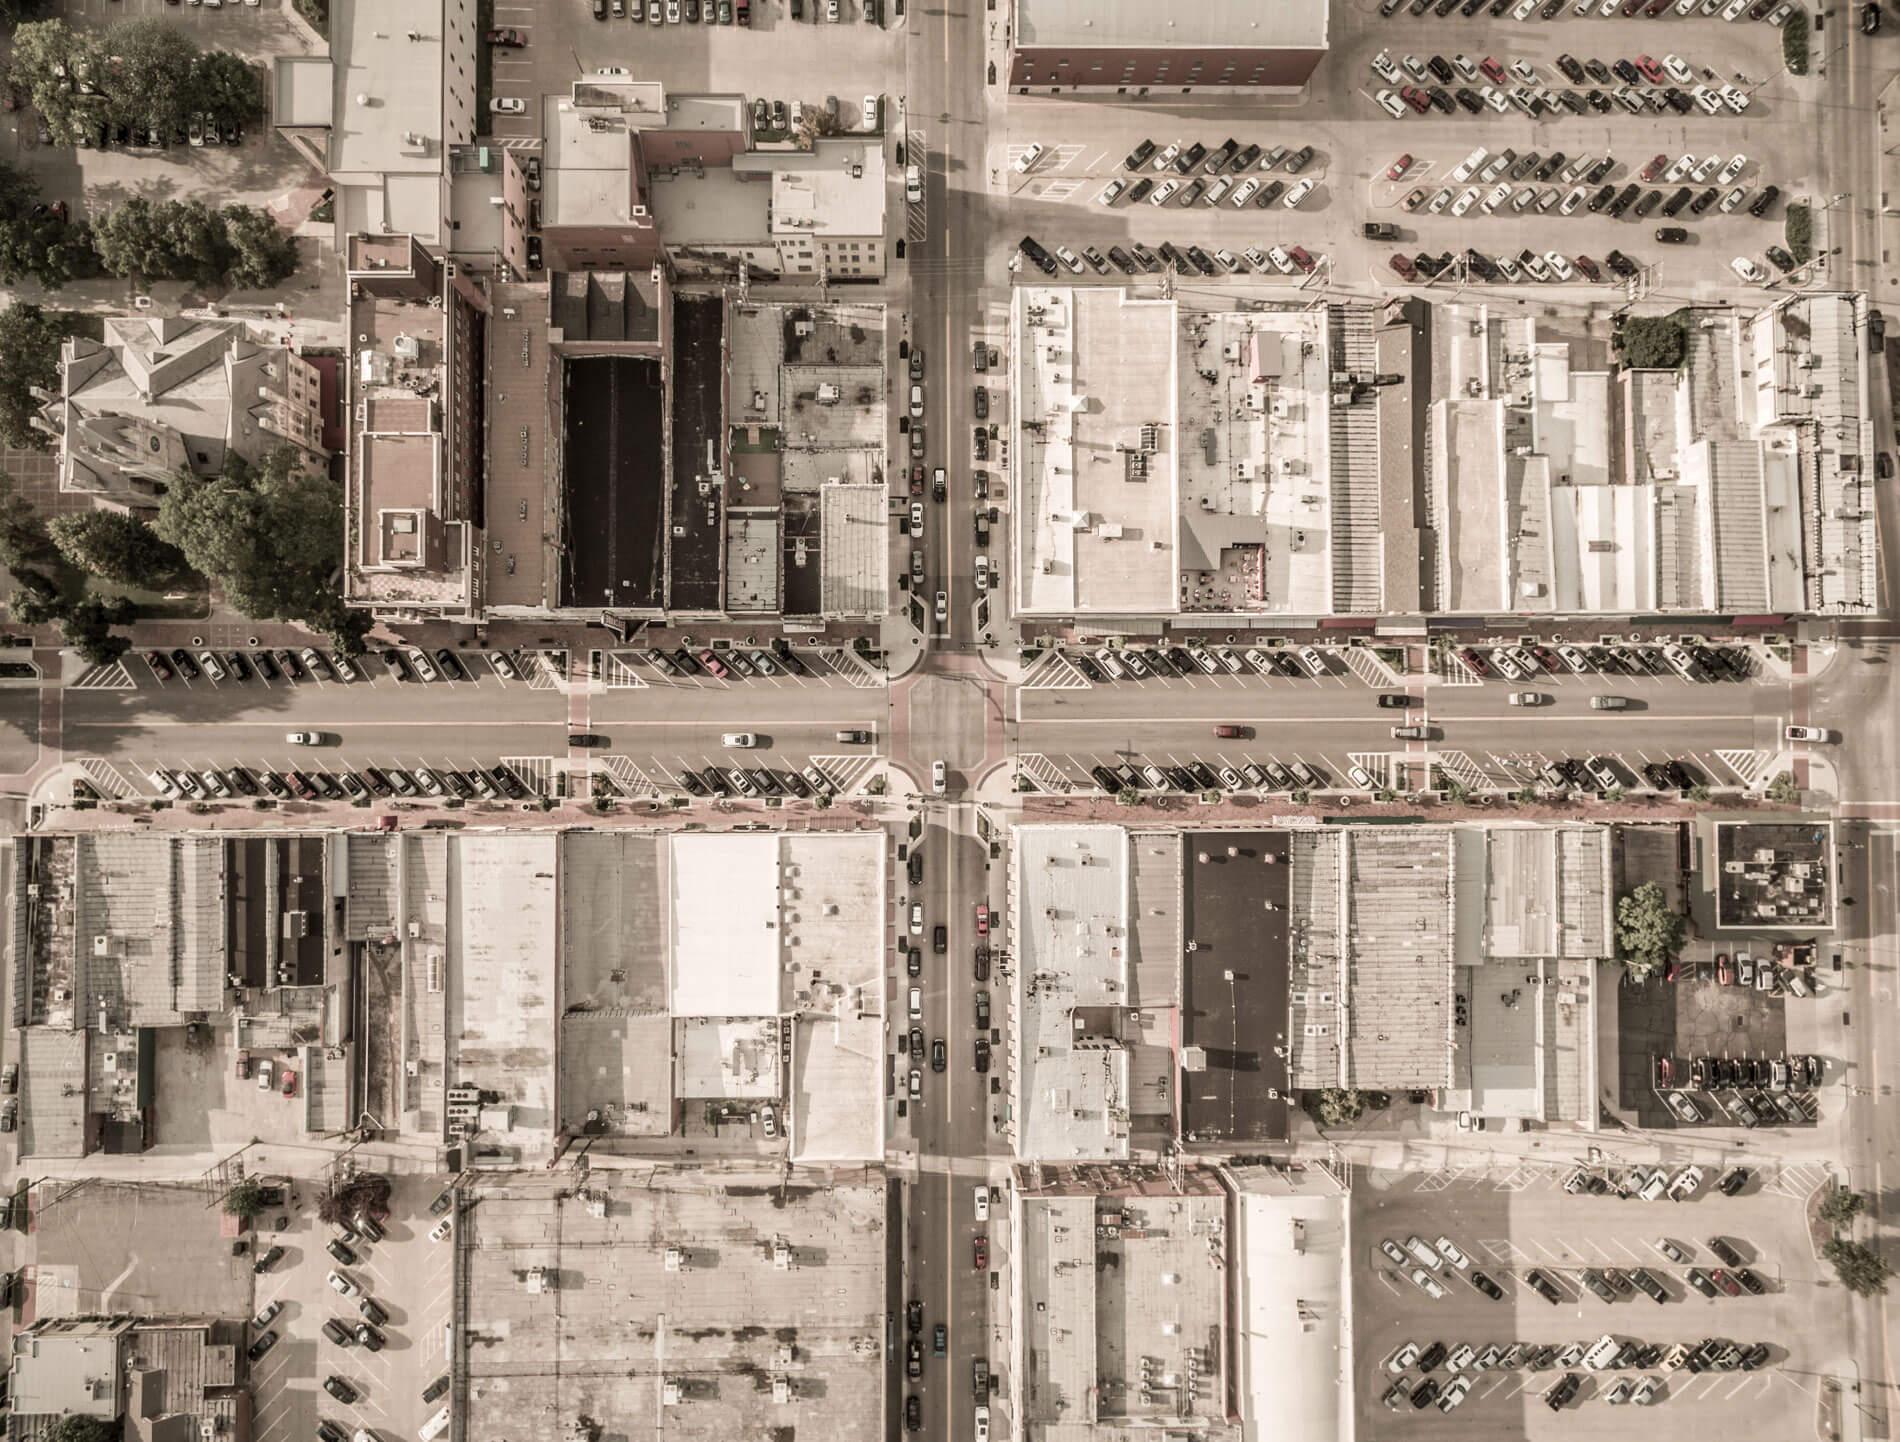 Poyntz Avenue Aerial Photo